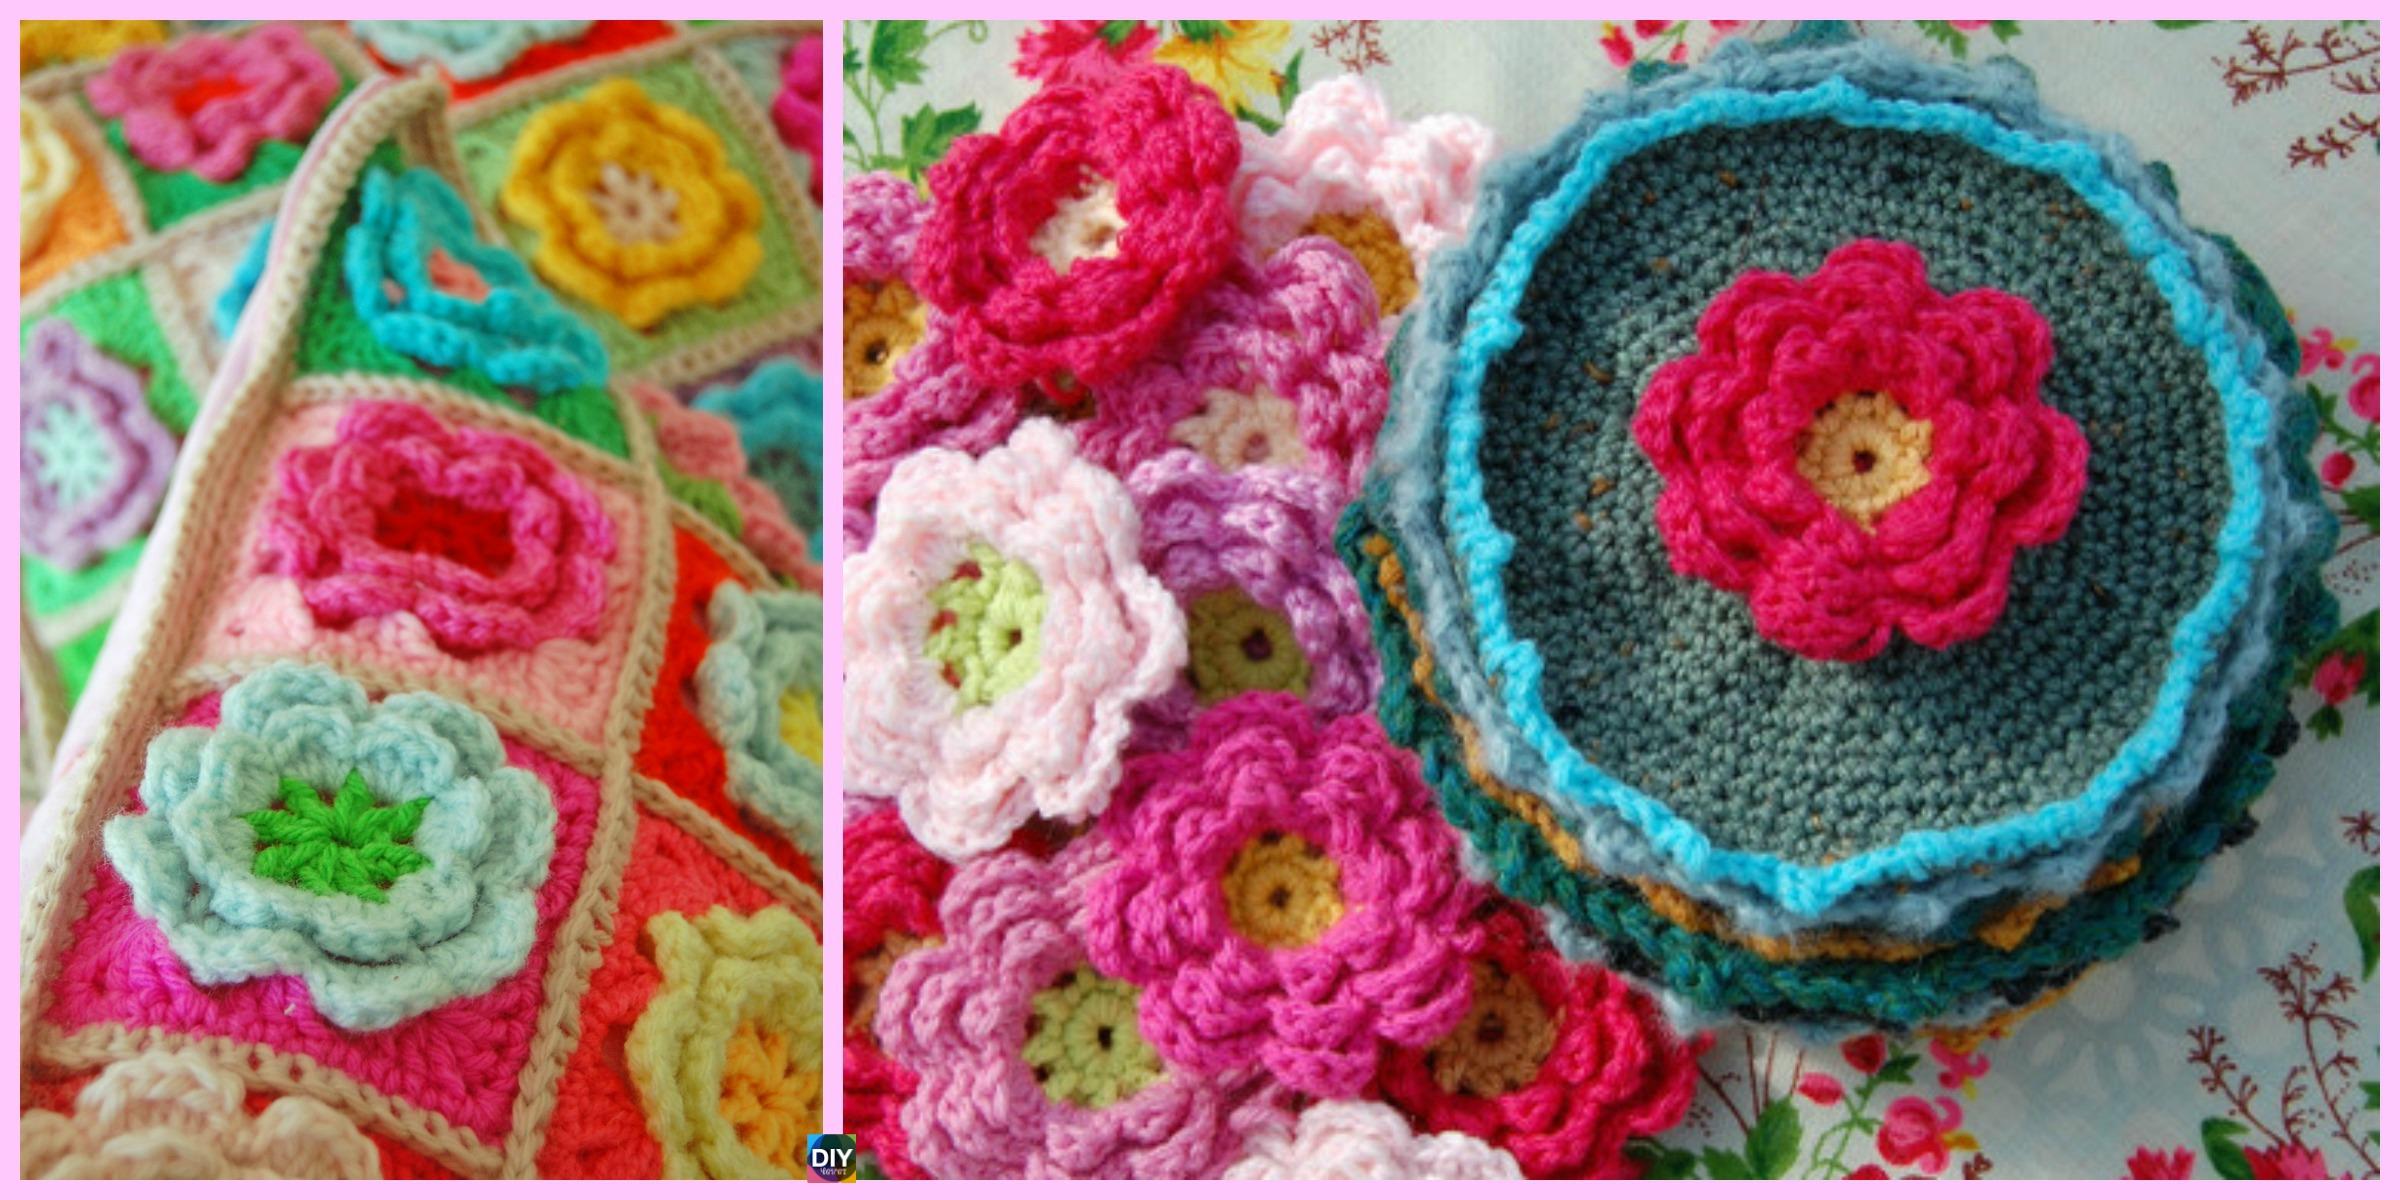 Crochet Rose Flower Squares - Free Pattern - DIY 4 EVER